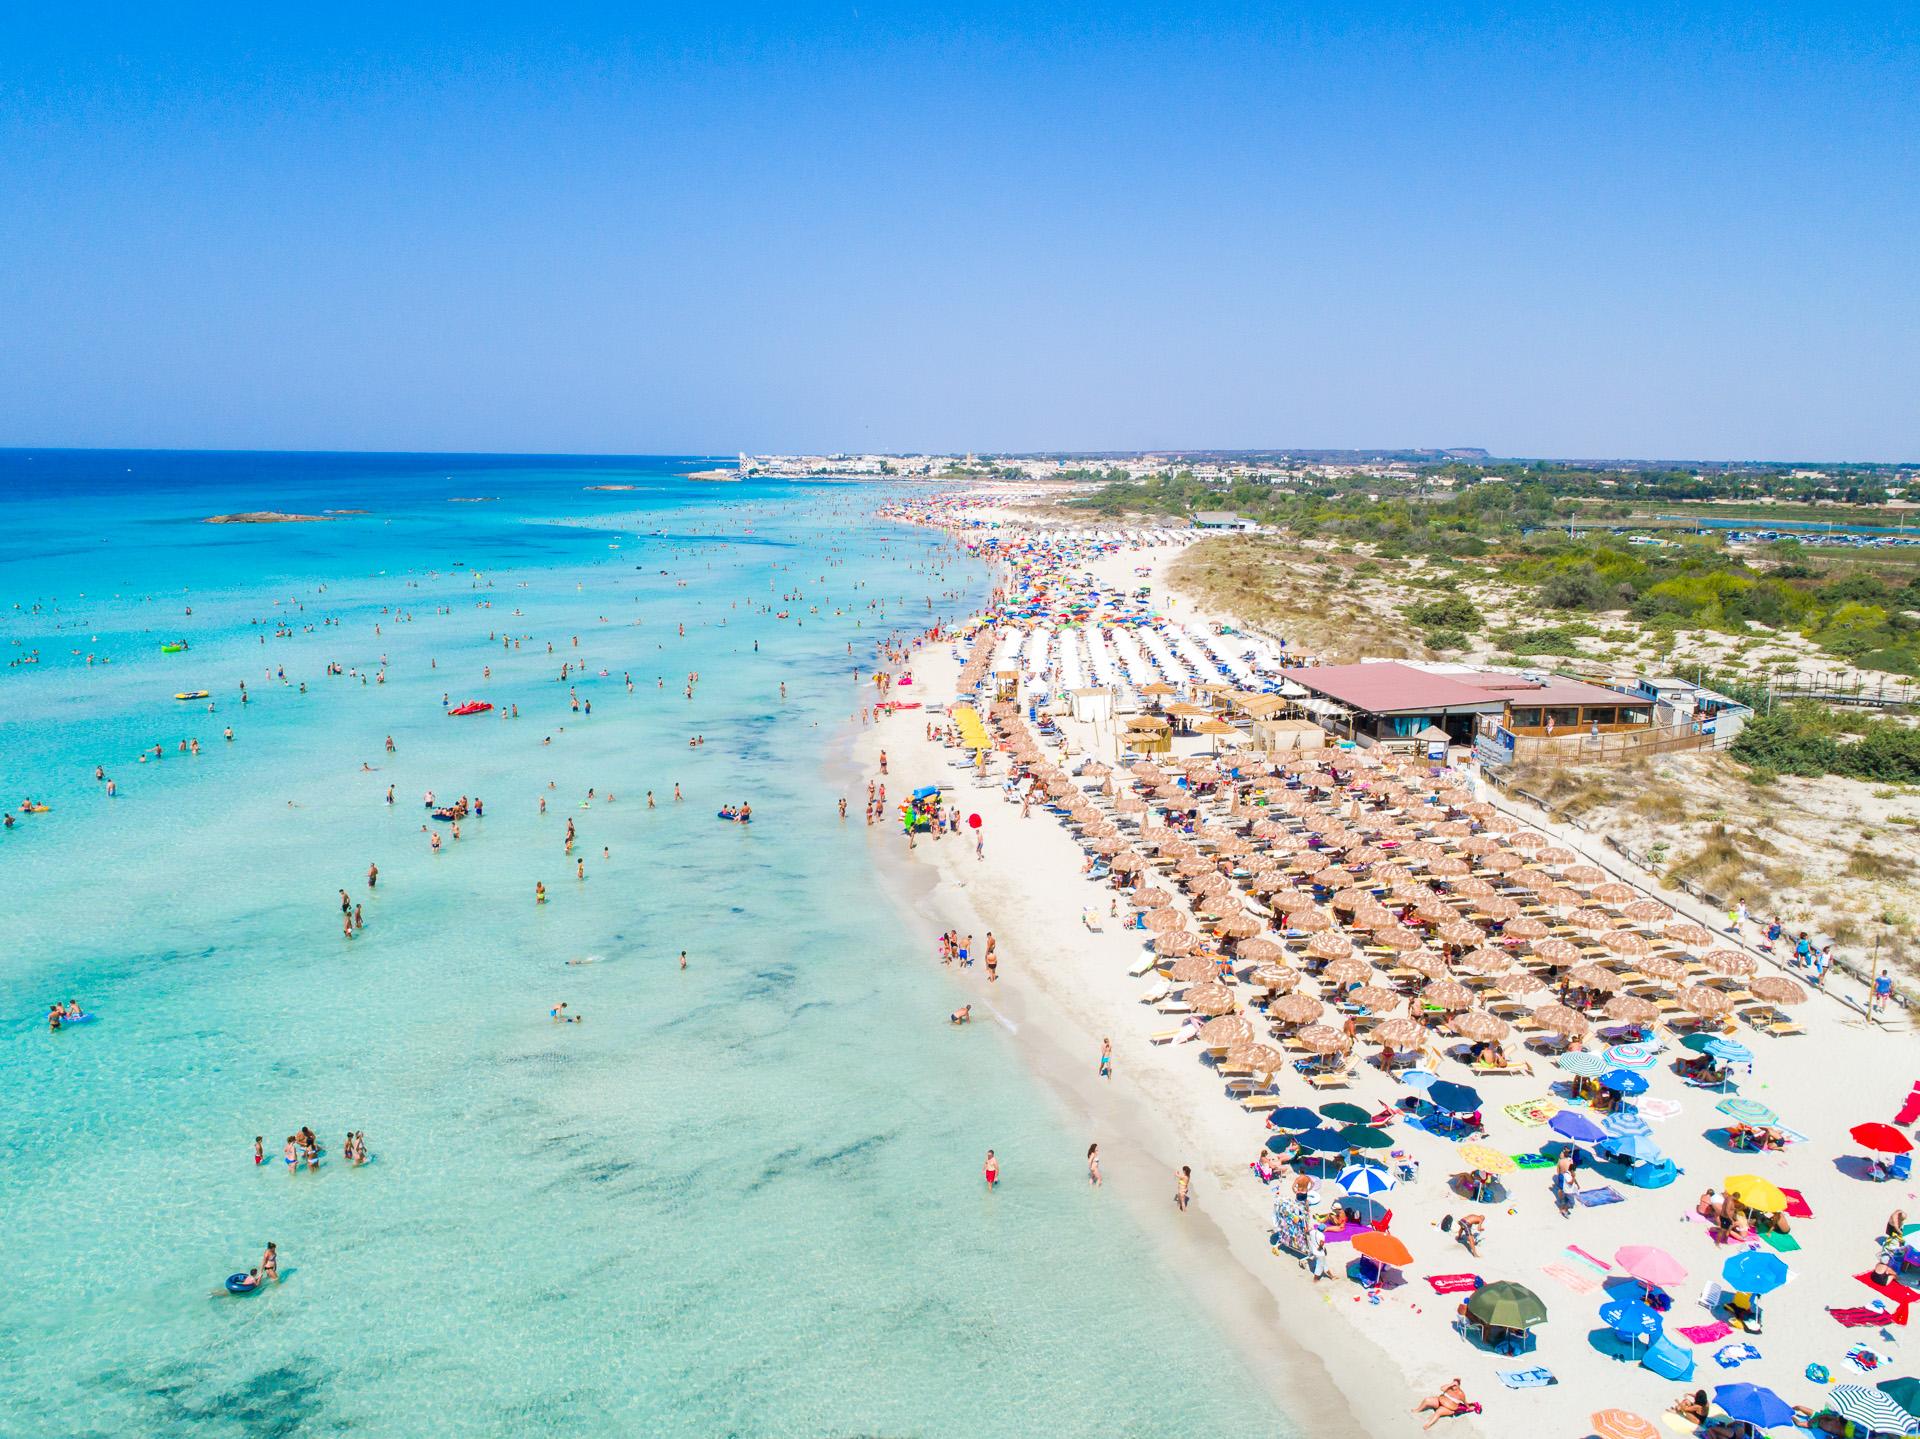 Matrimonio In Spiaggia Ugento : Vivosa apulia resort parco naturale regionale litorale di ugento